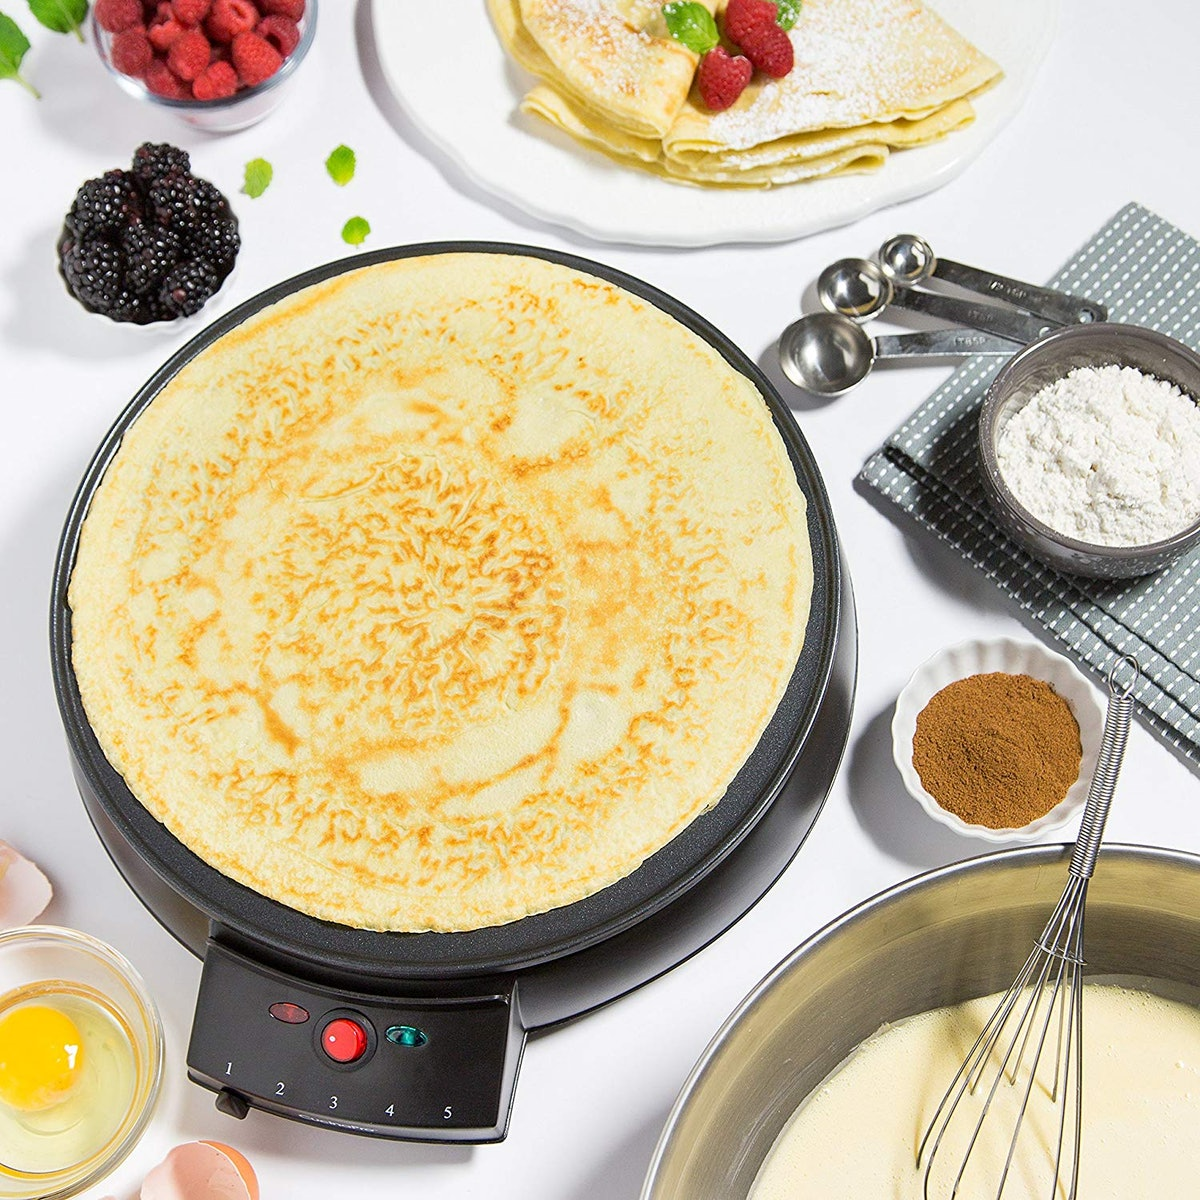 CucinaPro Crepe Maker